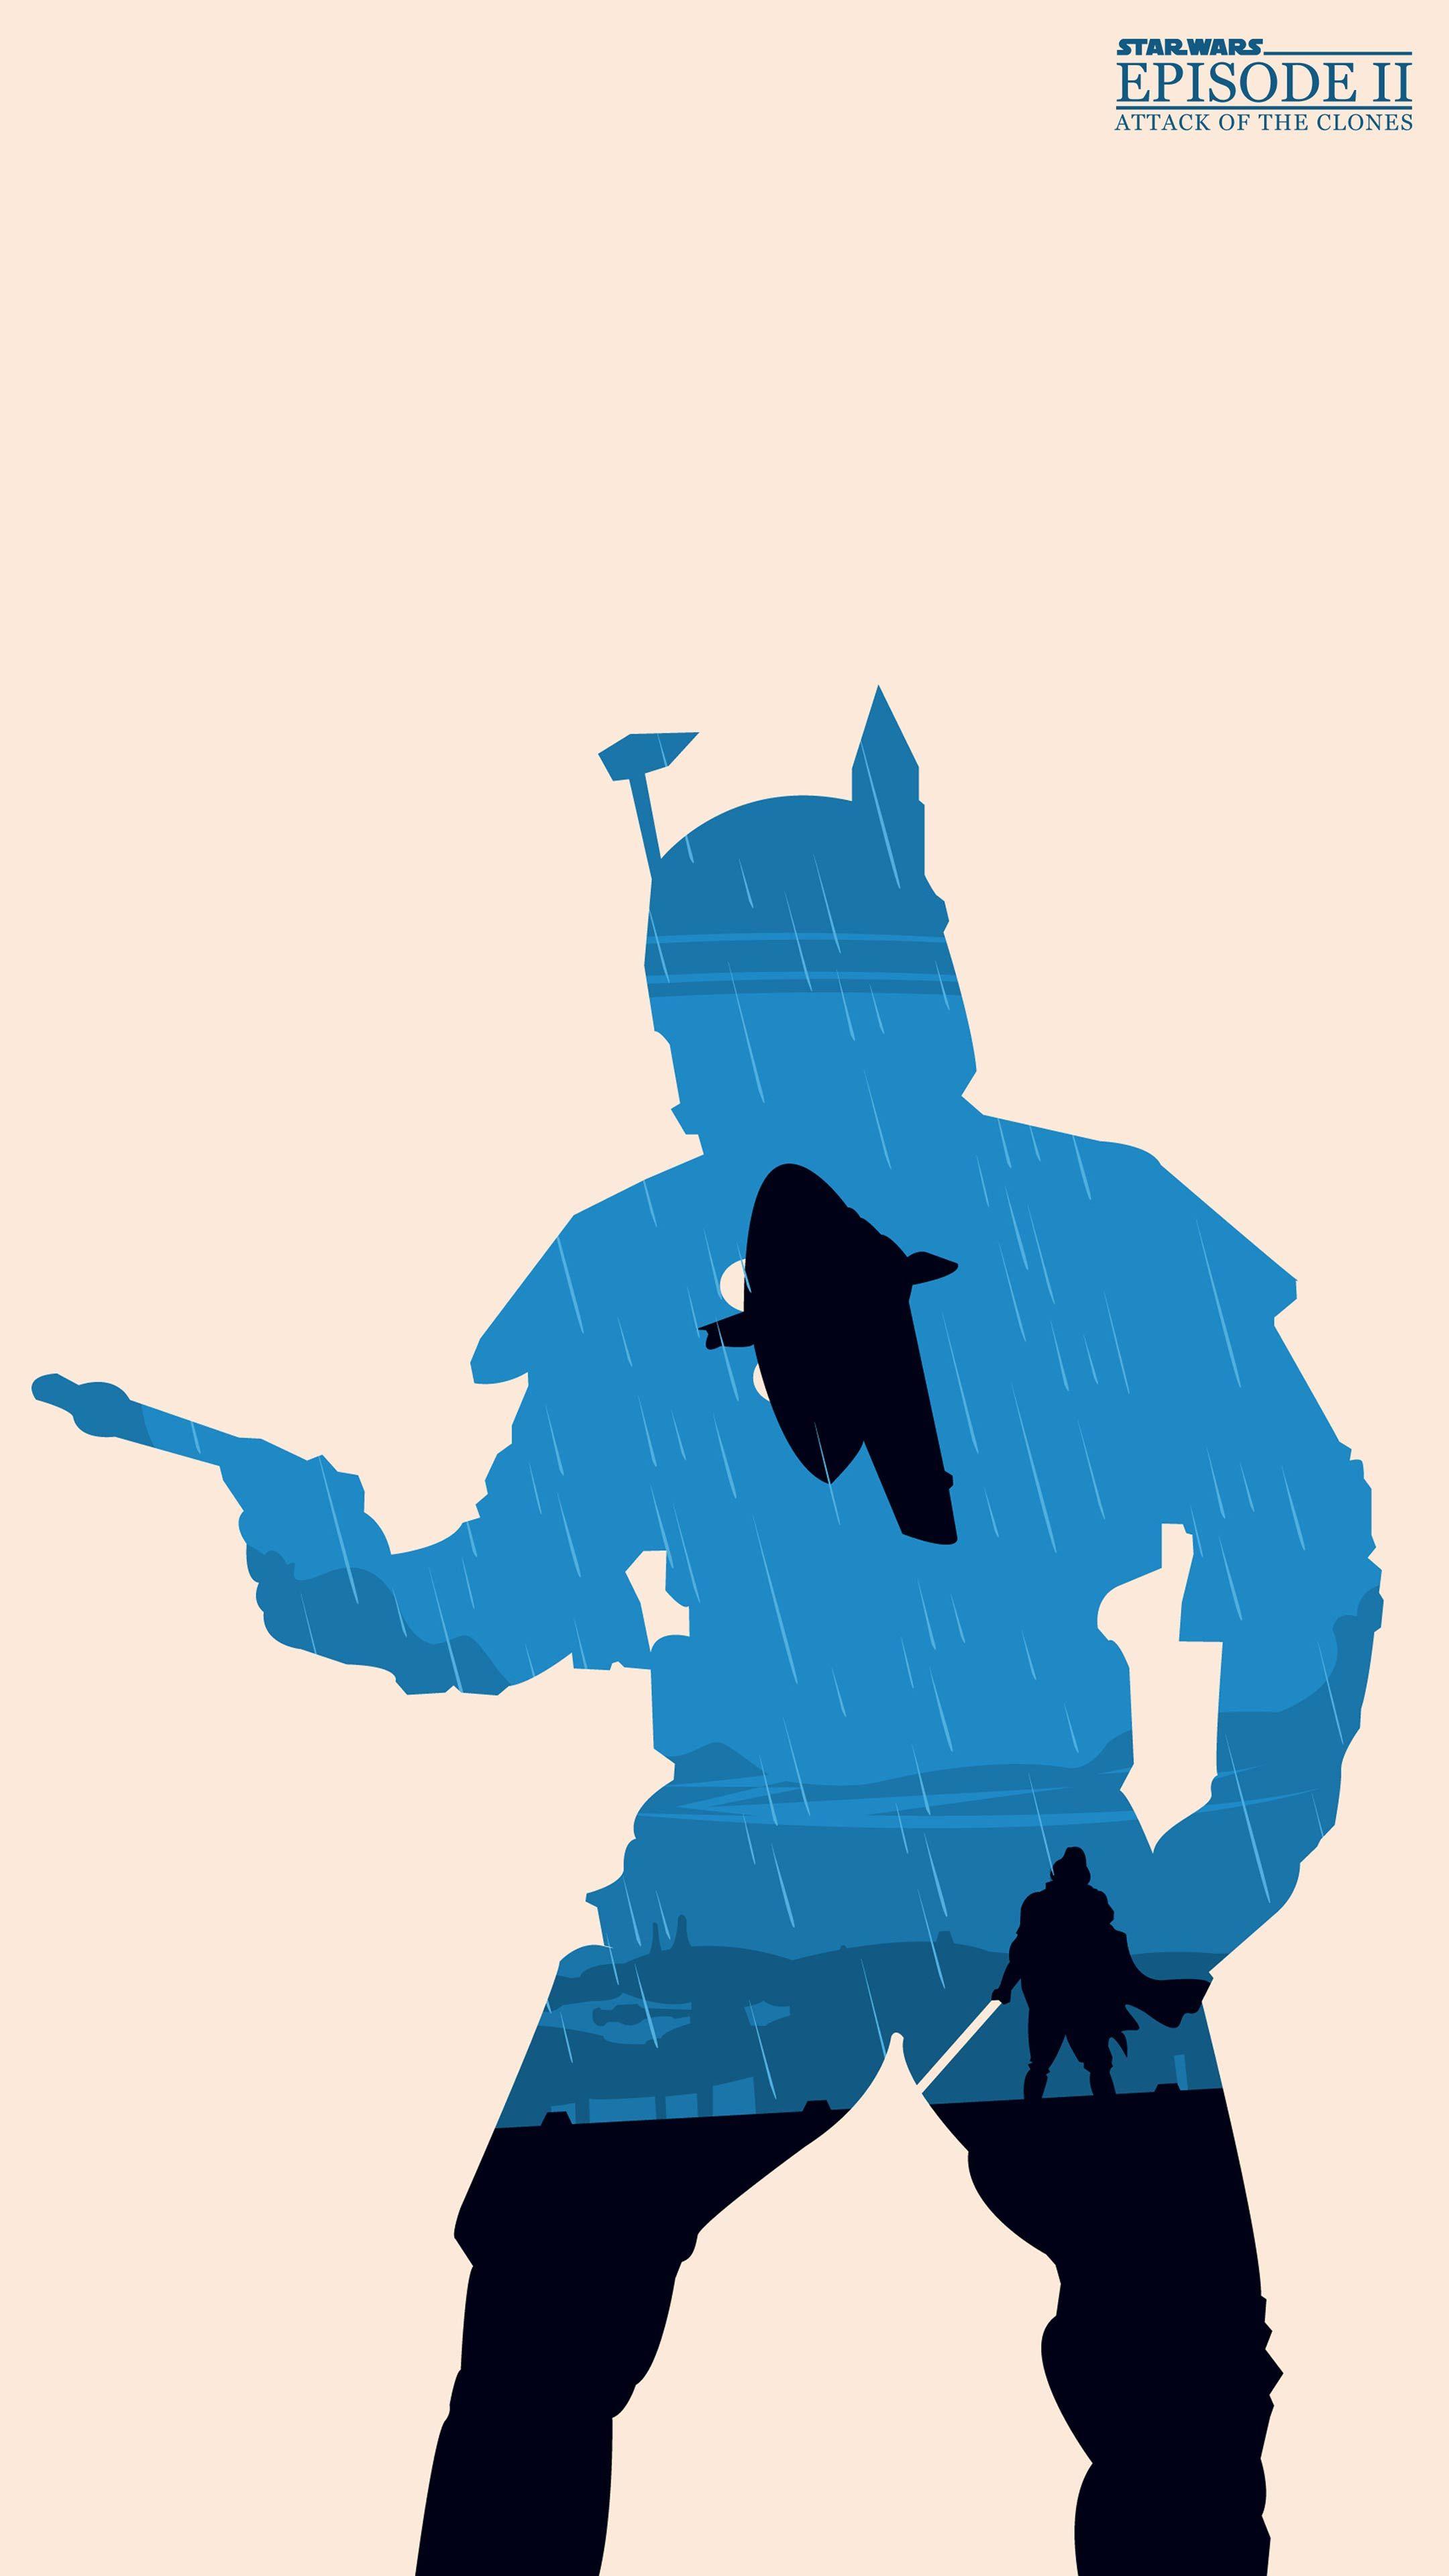 storm trooper star wars illustration android wallpaper free download